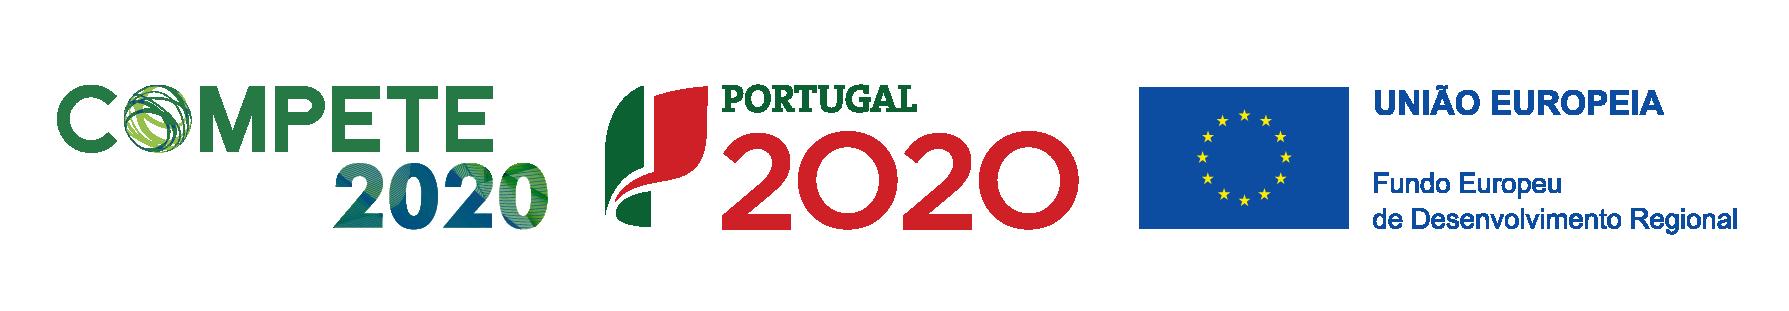 pt2020-compete